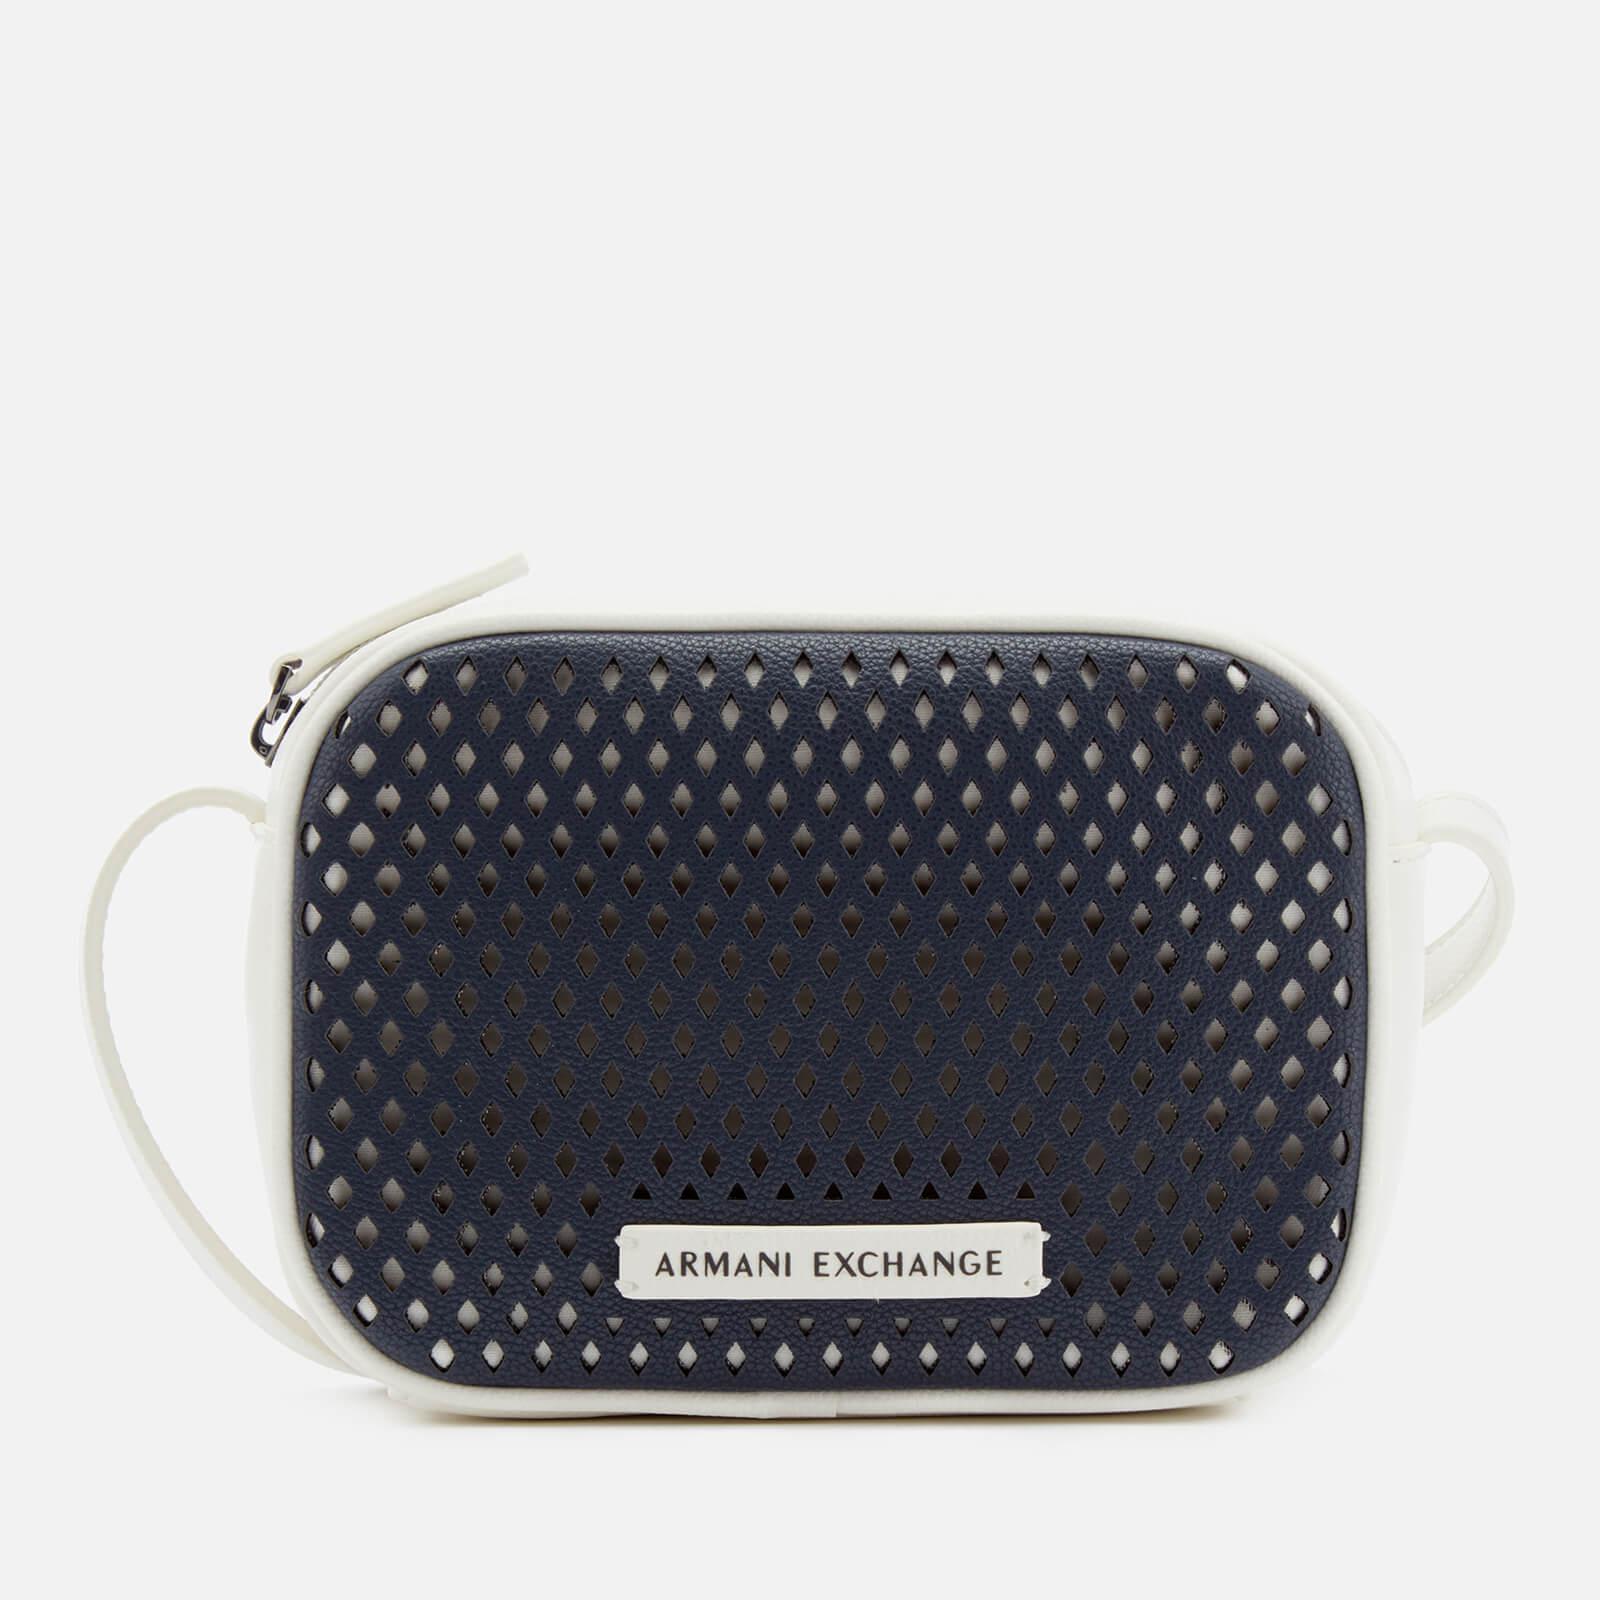 Armani Exchange - Blue Perforated Cross Body Bag - Lyst. View fullscreen 7f61270ec2